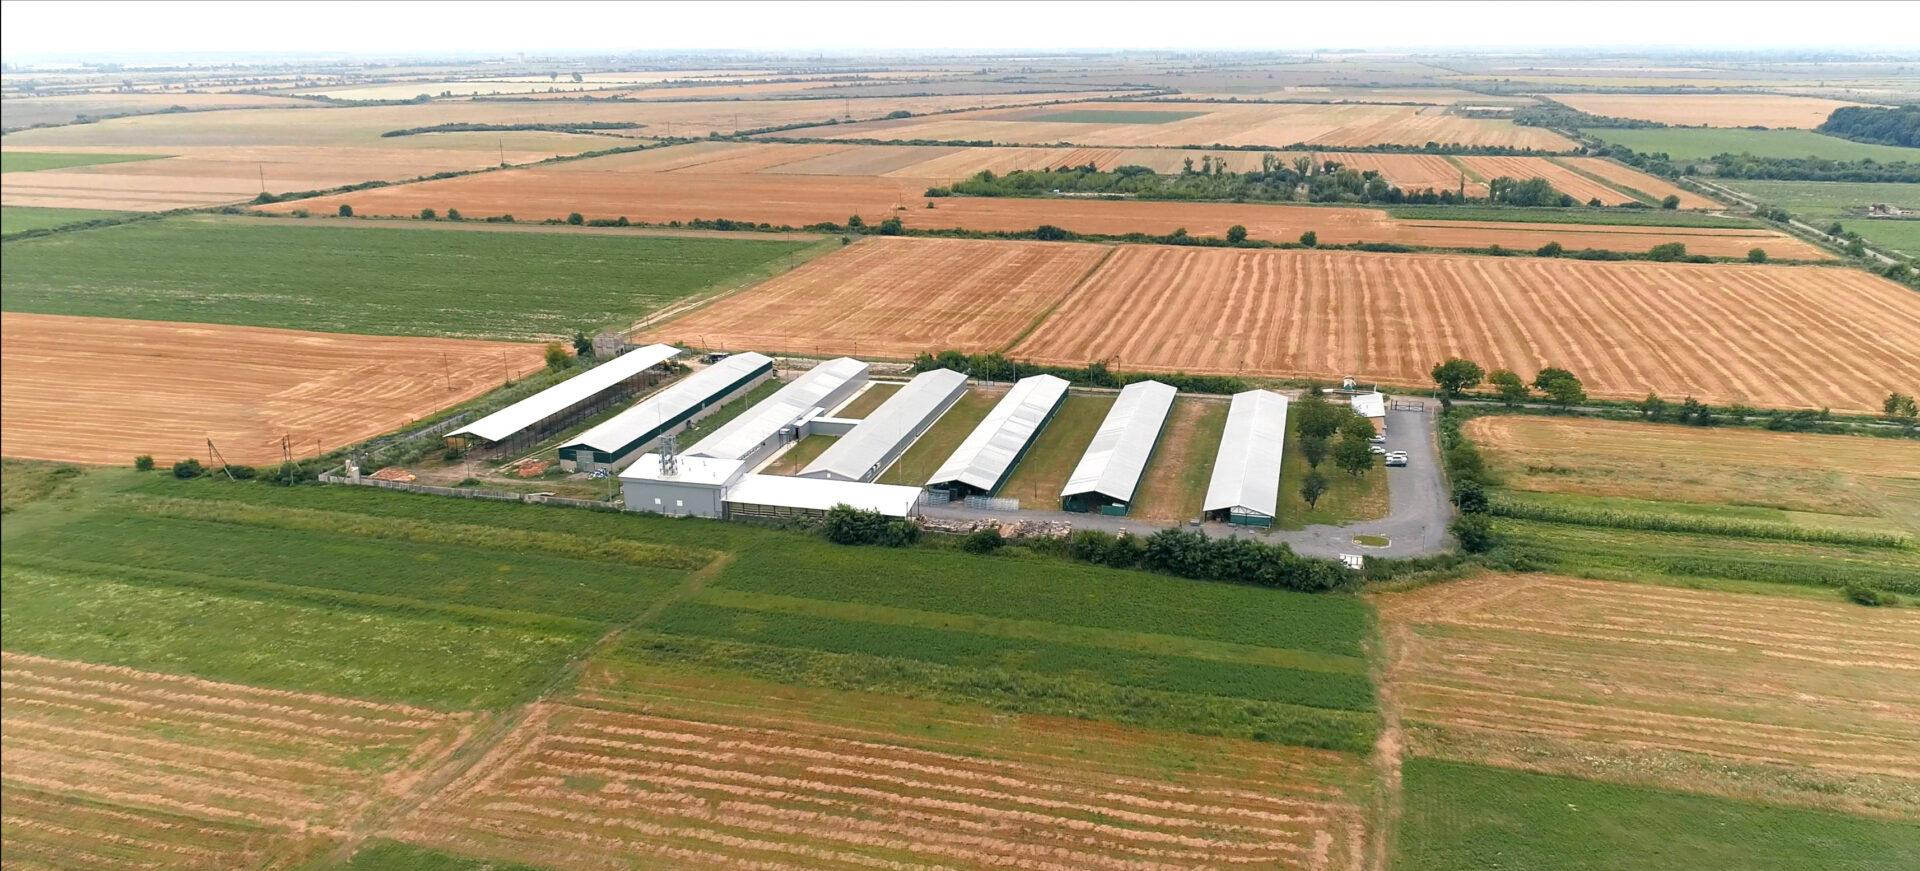 Shiitake farm Ukraine